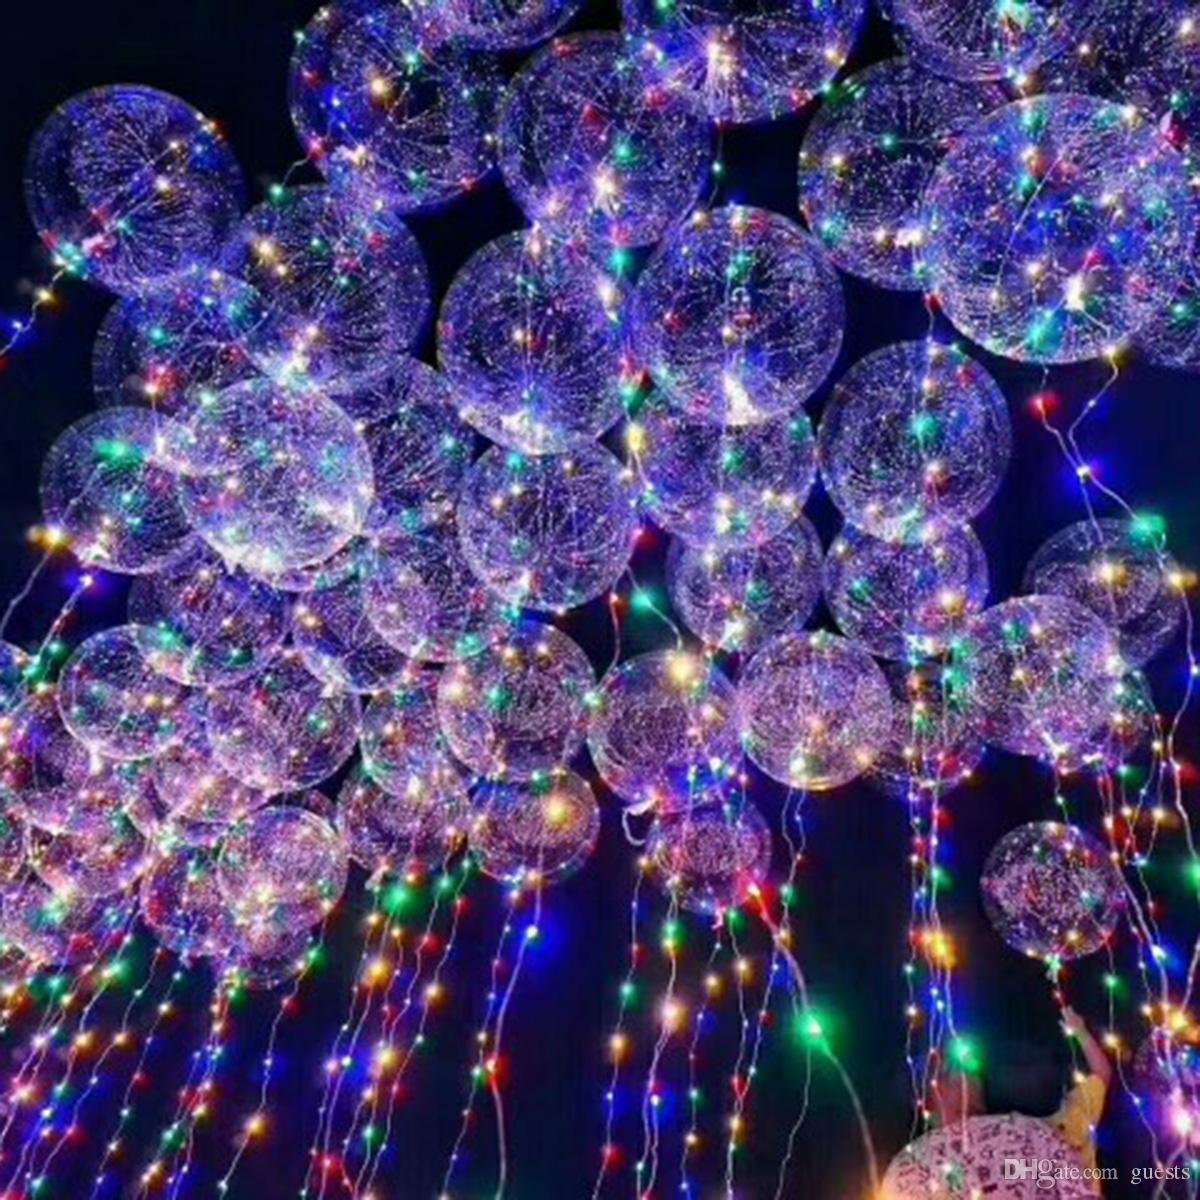 light up jouets led guirlandes lumineuses 30 Bon Marché Ou Acheter Guirlande Lumineuse Zat3